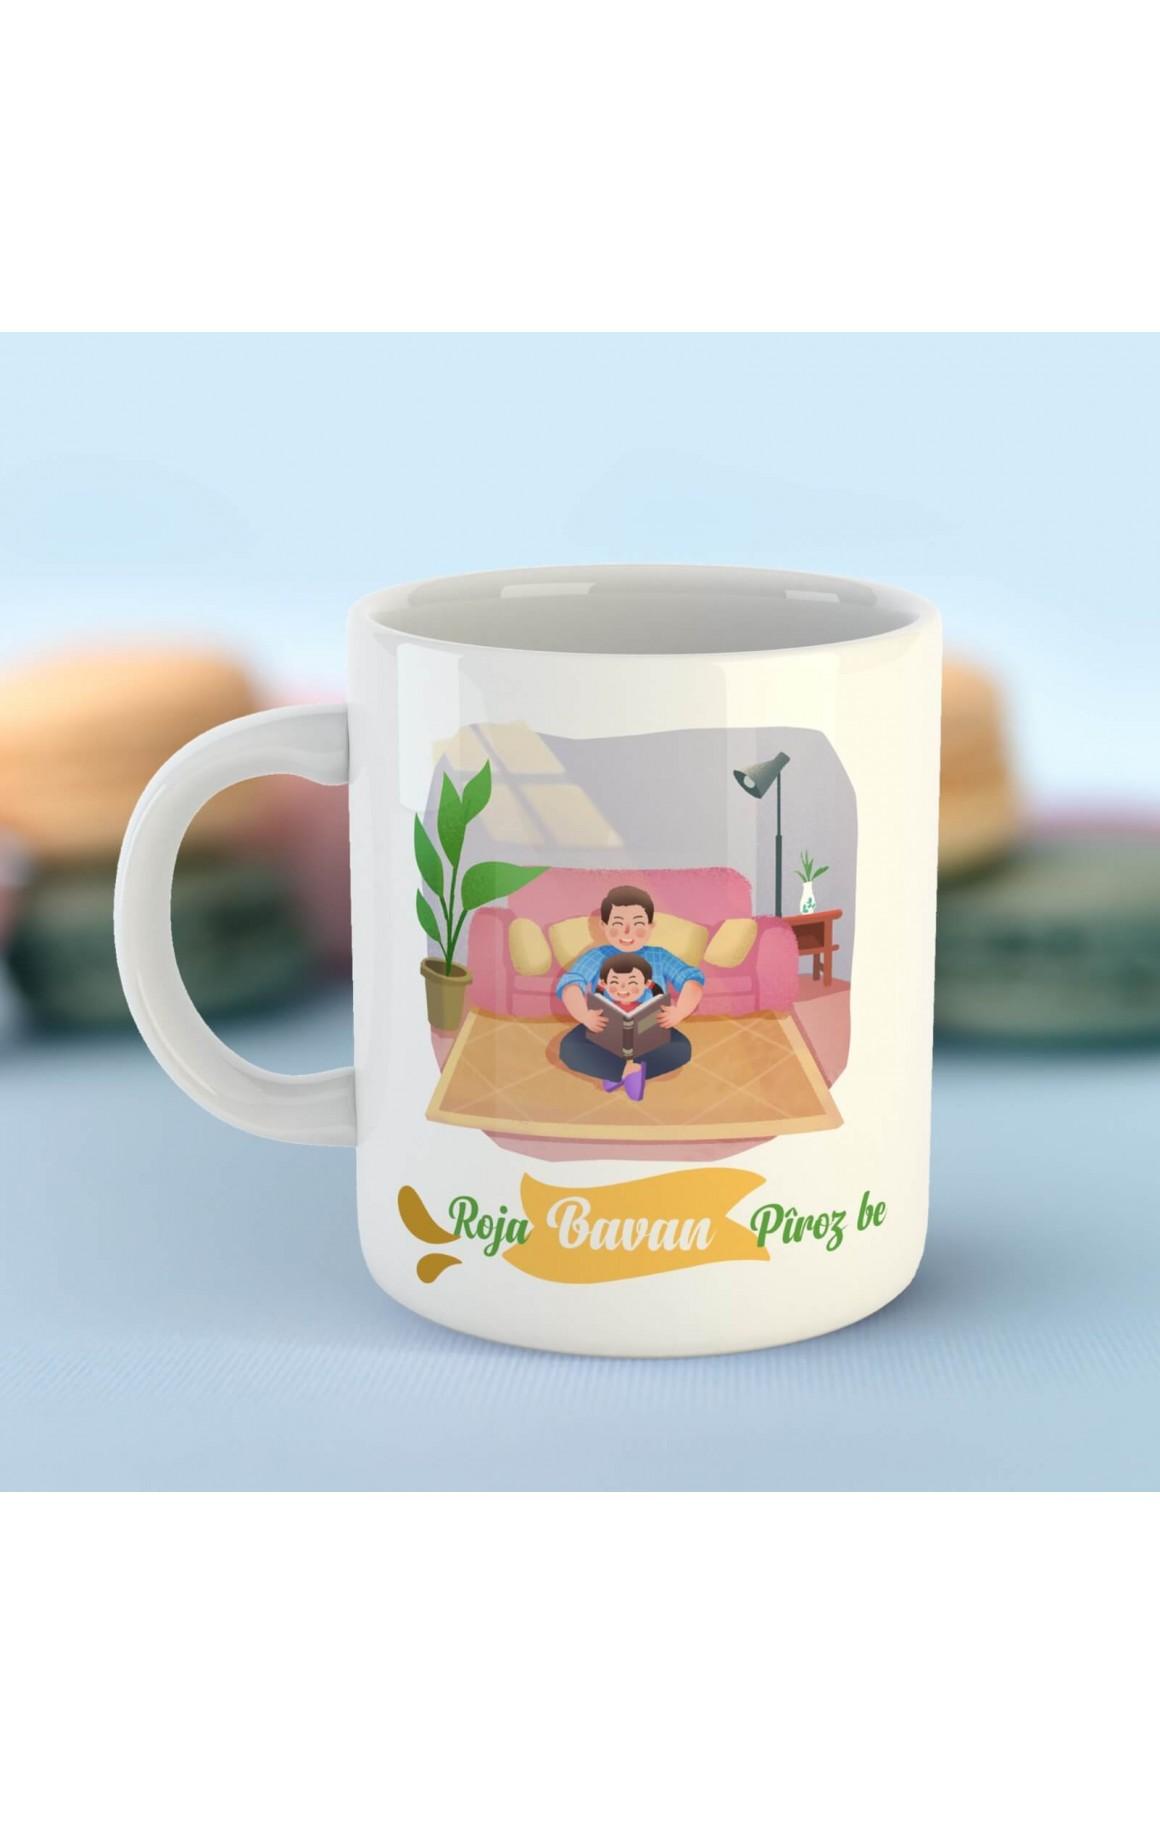 Babalara Özel Porselen Kupa - Roja Bavan